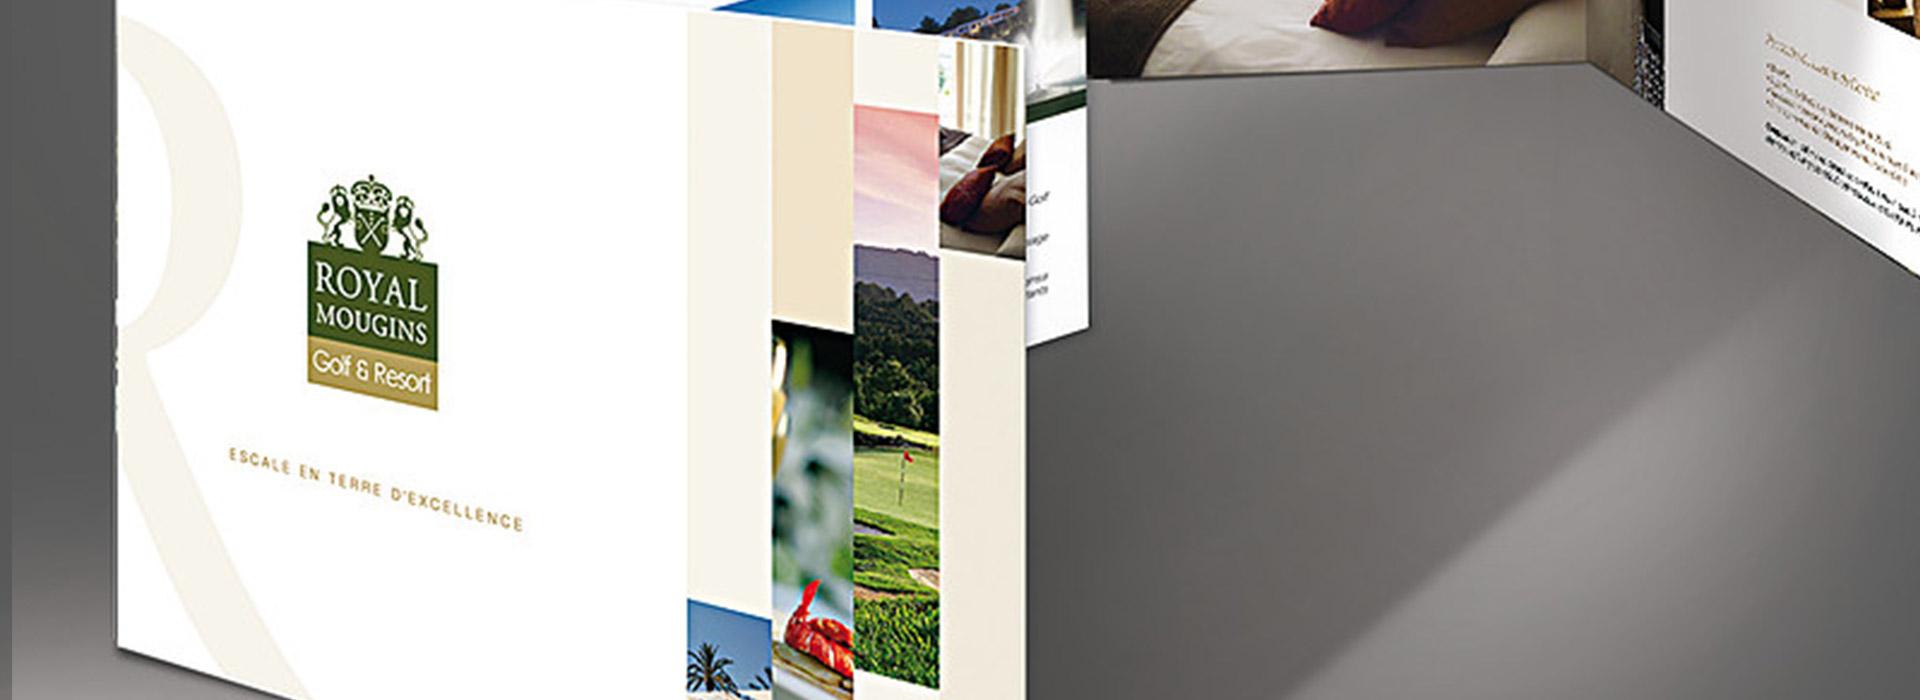 http://agence-adsolue-communication-royal-mougins-resort-paysage-web